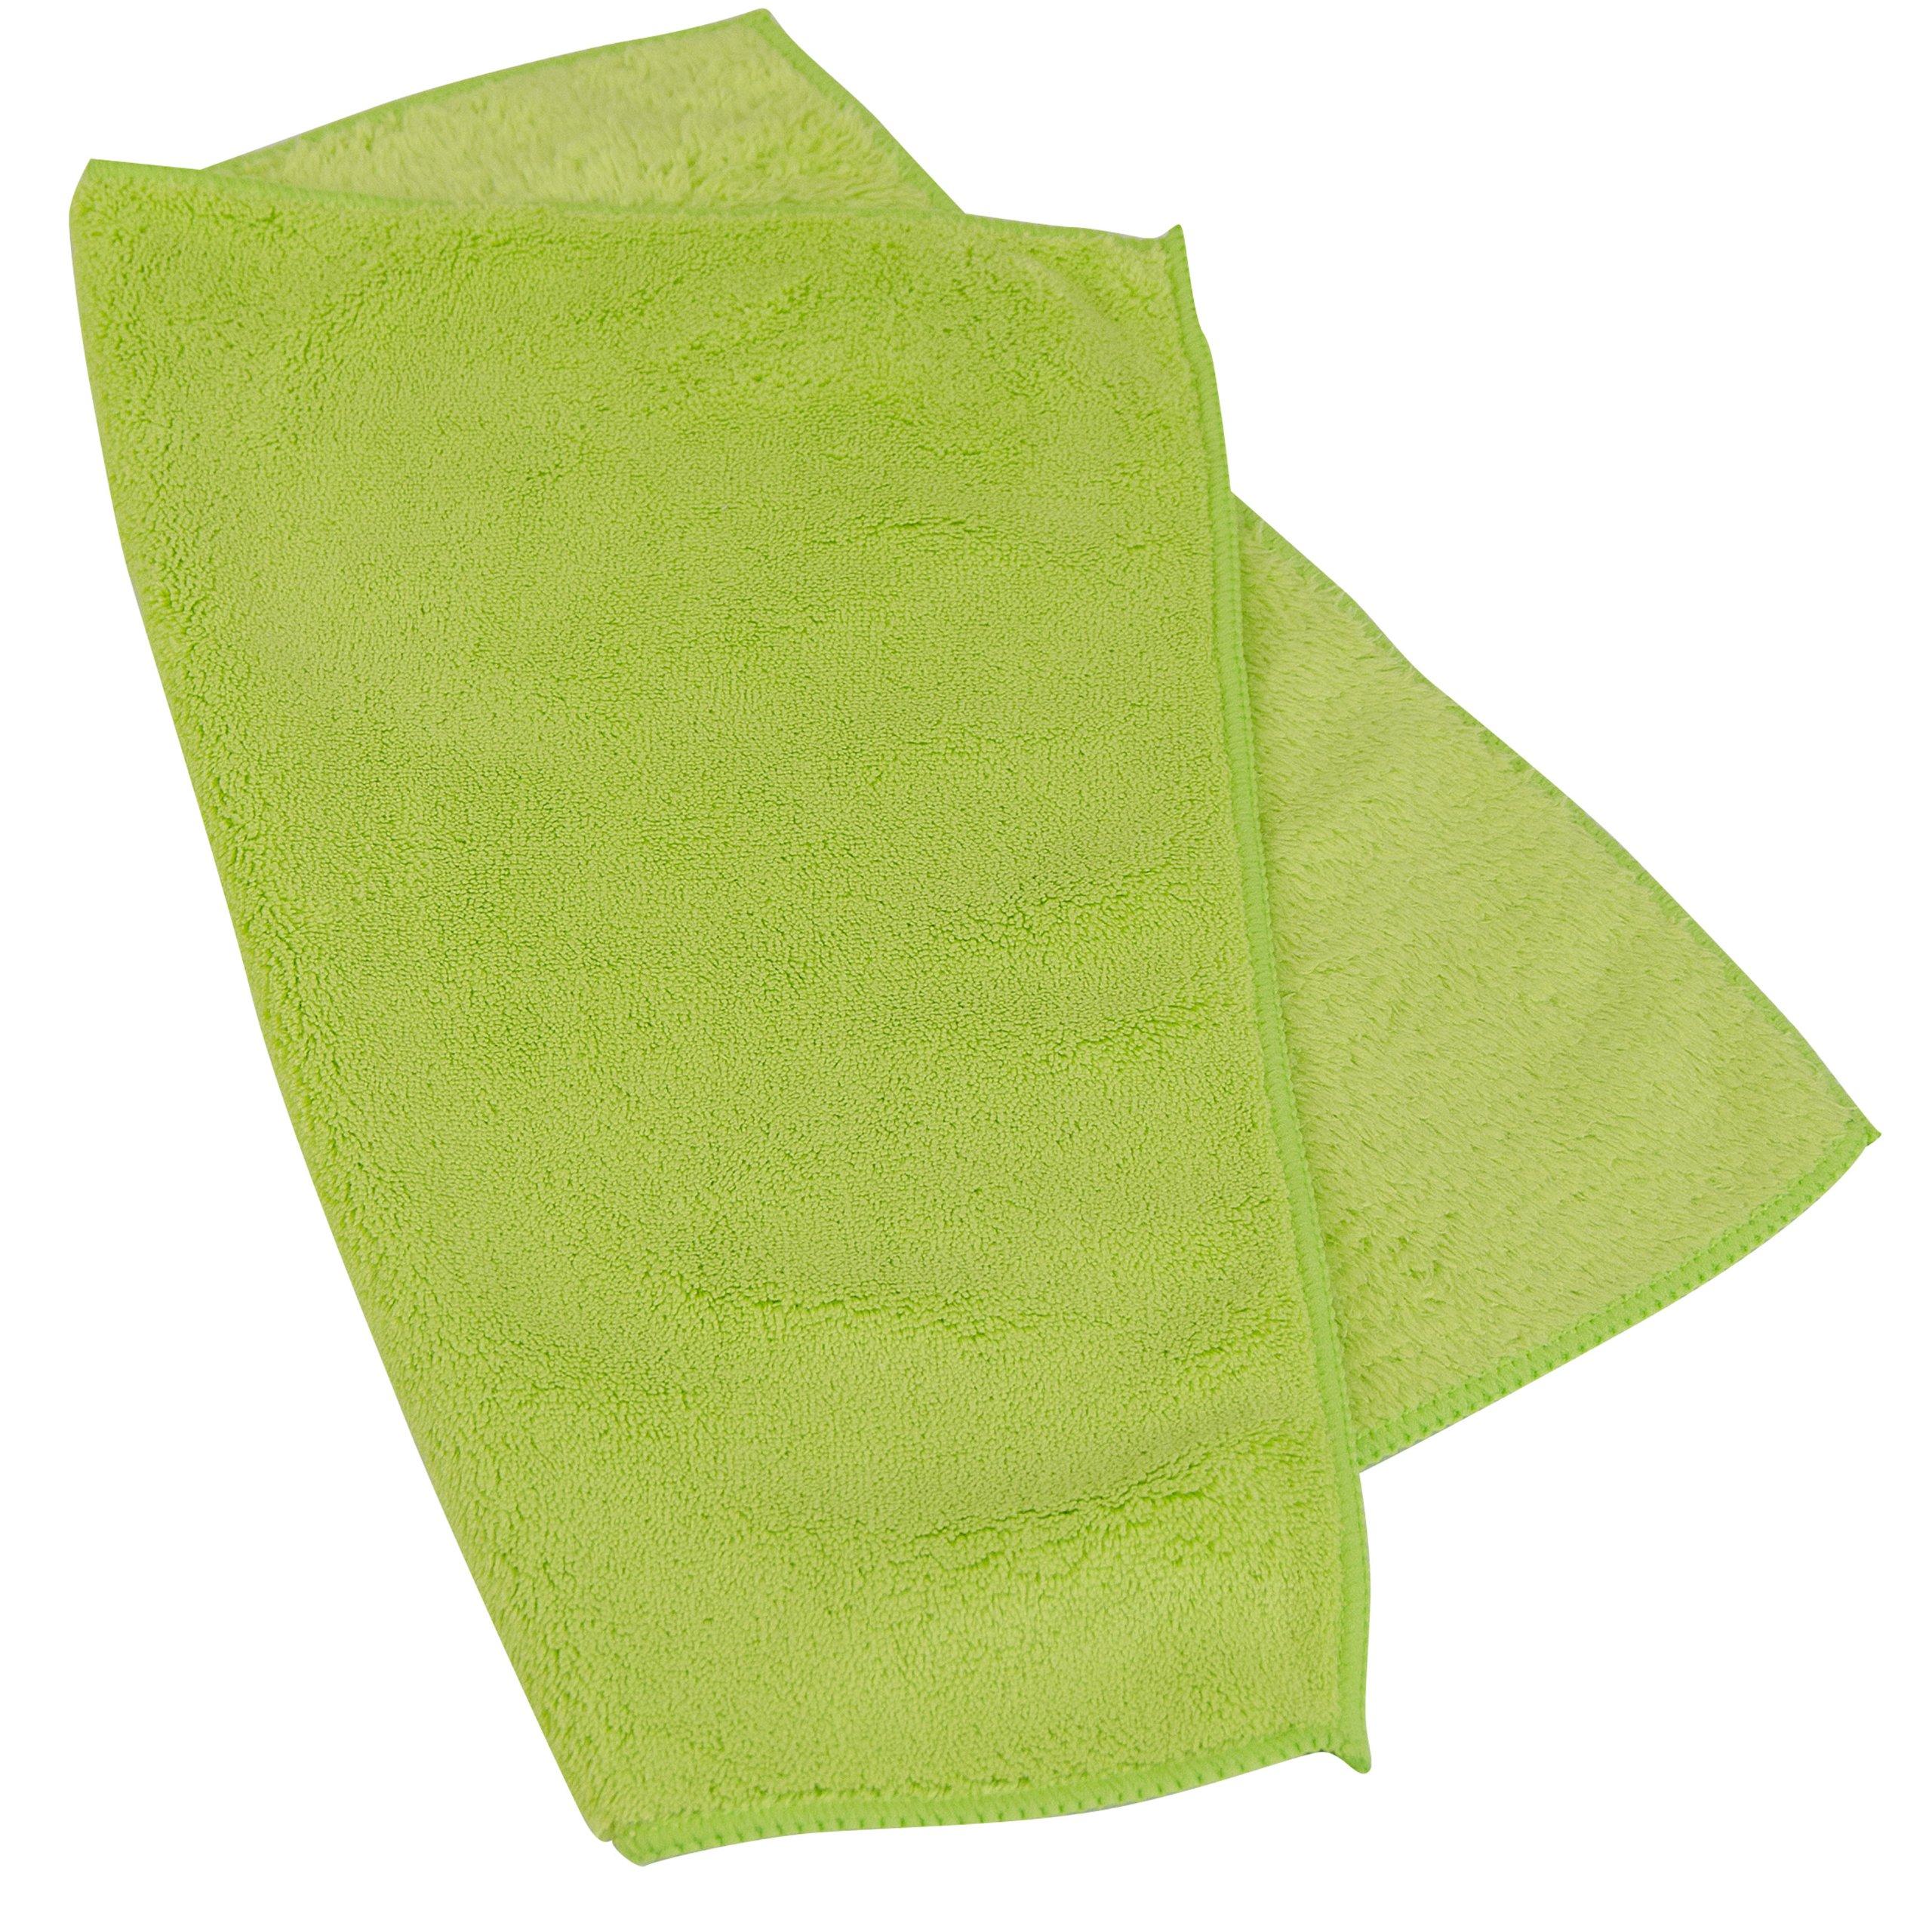 Quickie Auto Pro Ultra Plush Polishing Cloth product image